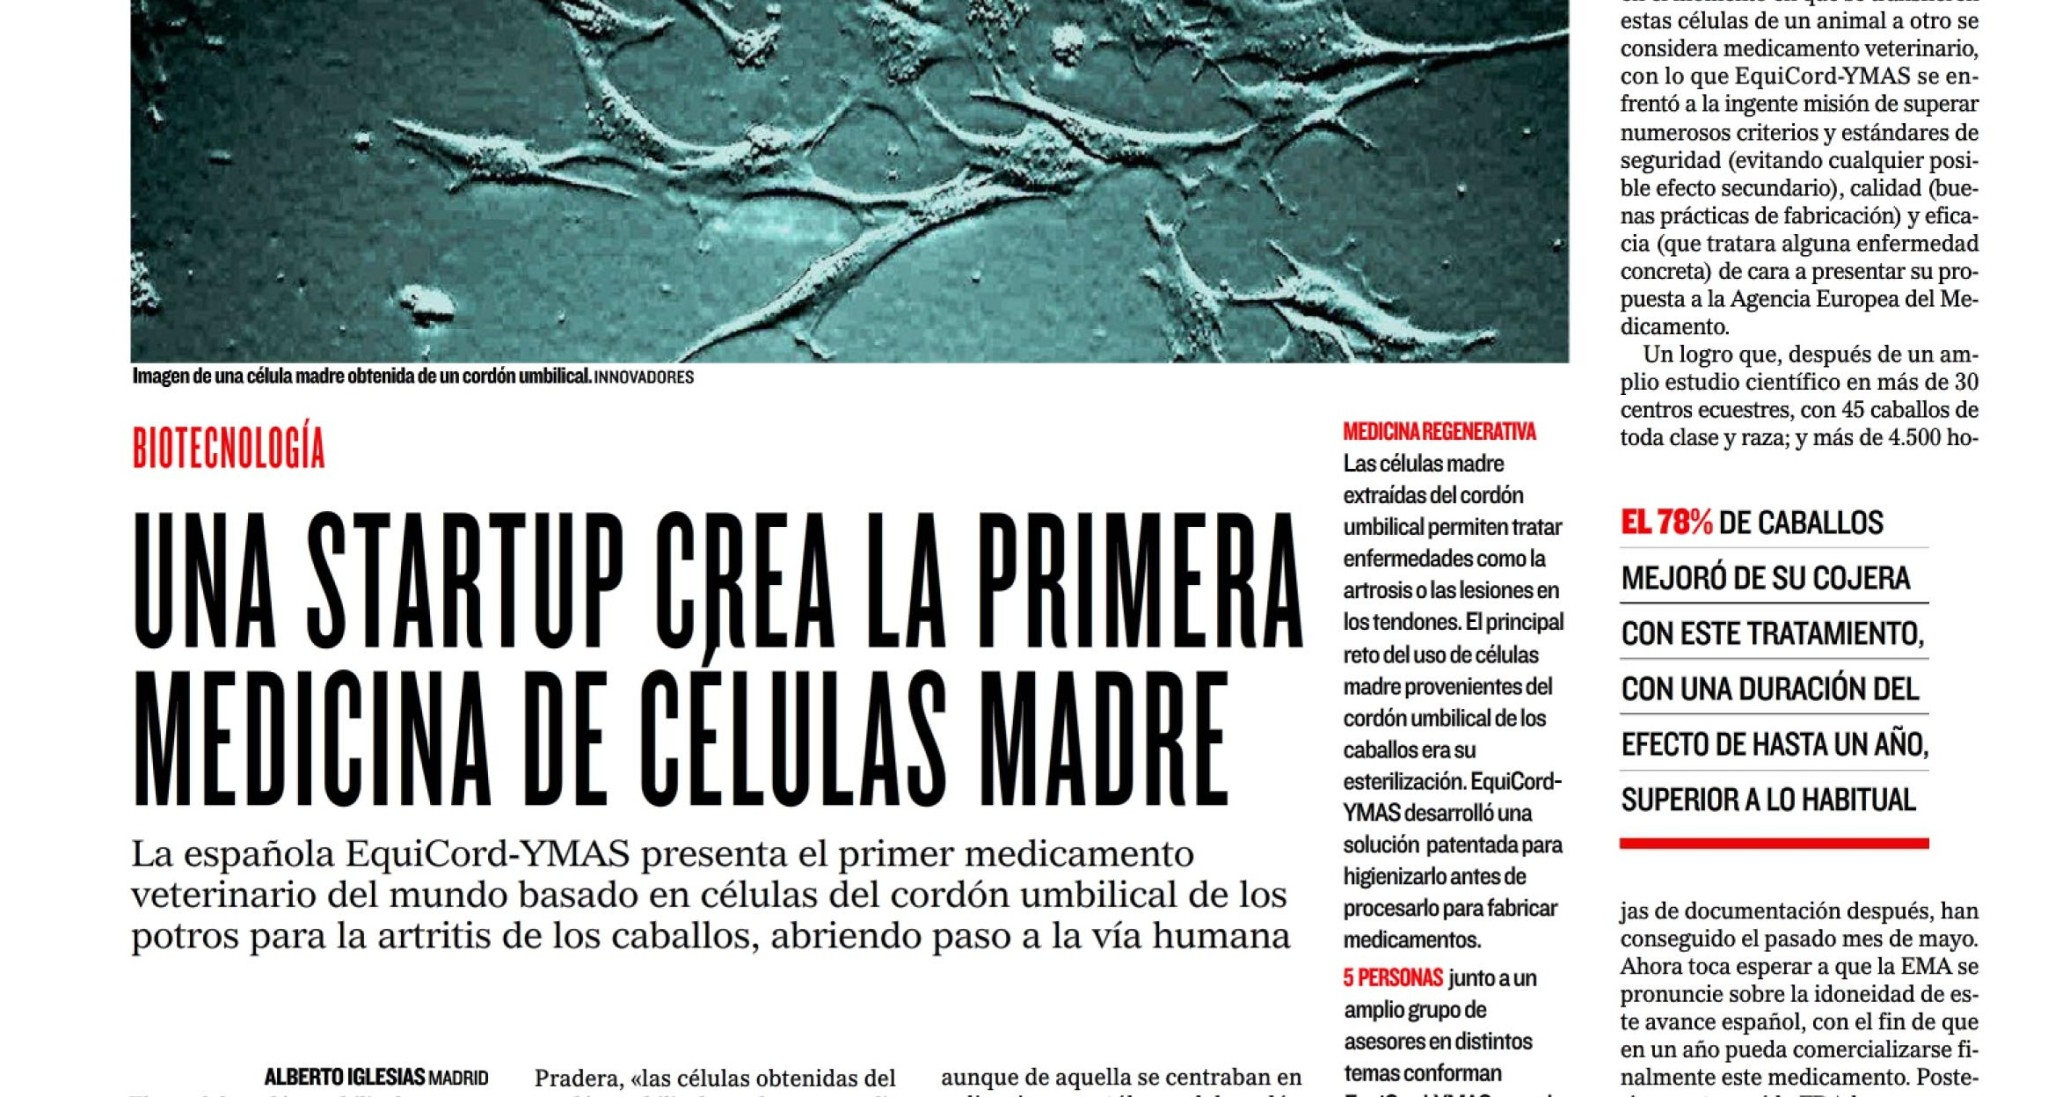 Cordón umbilical como medicamento veterinario de células madre